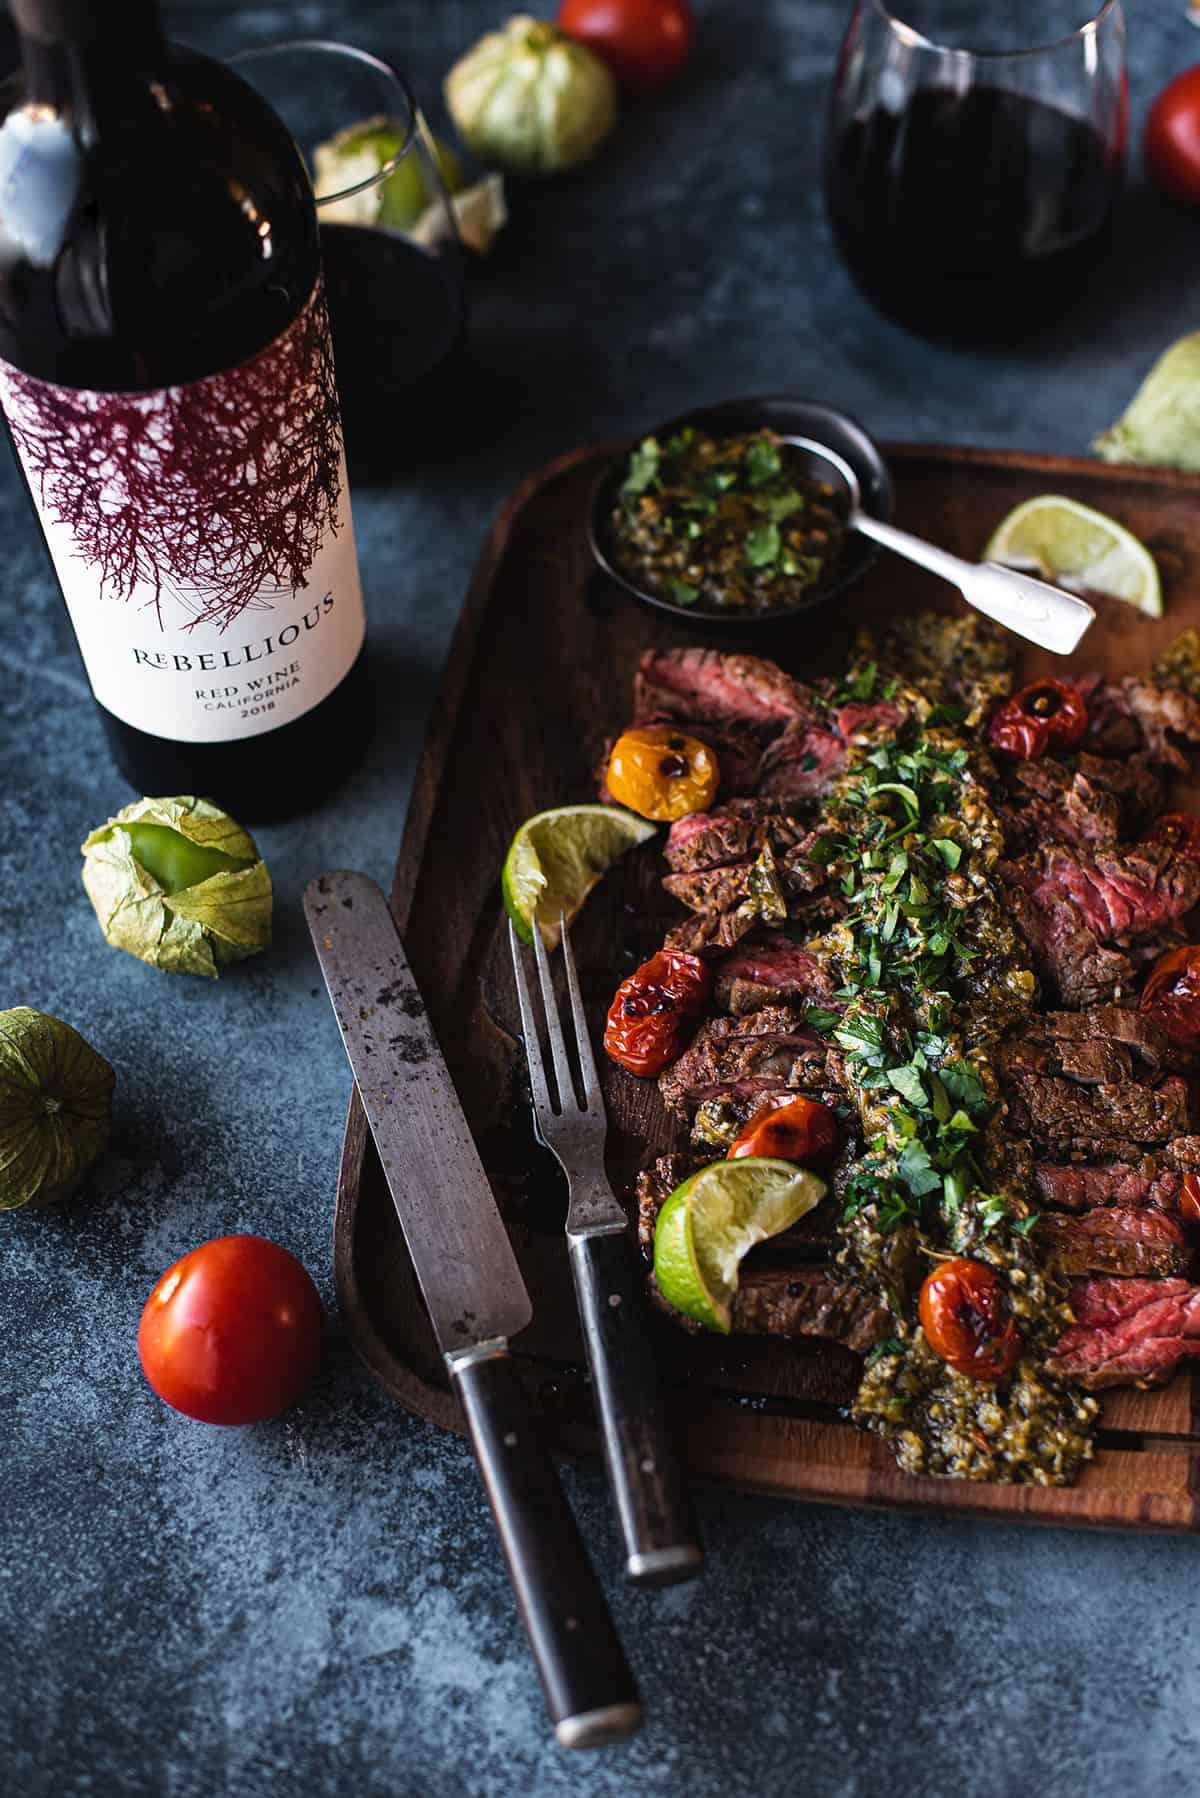 skirt steak on wood platter with fork & knife + chimichurri on top